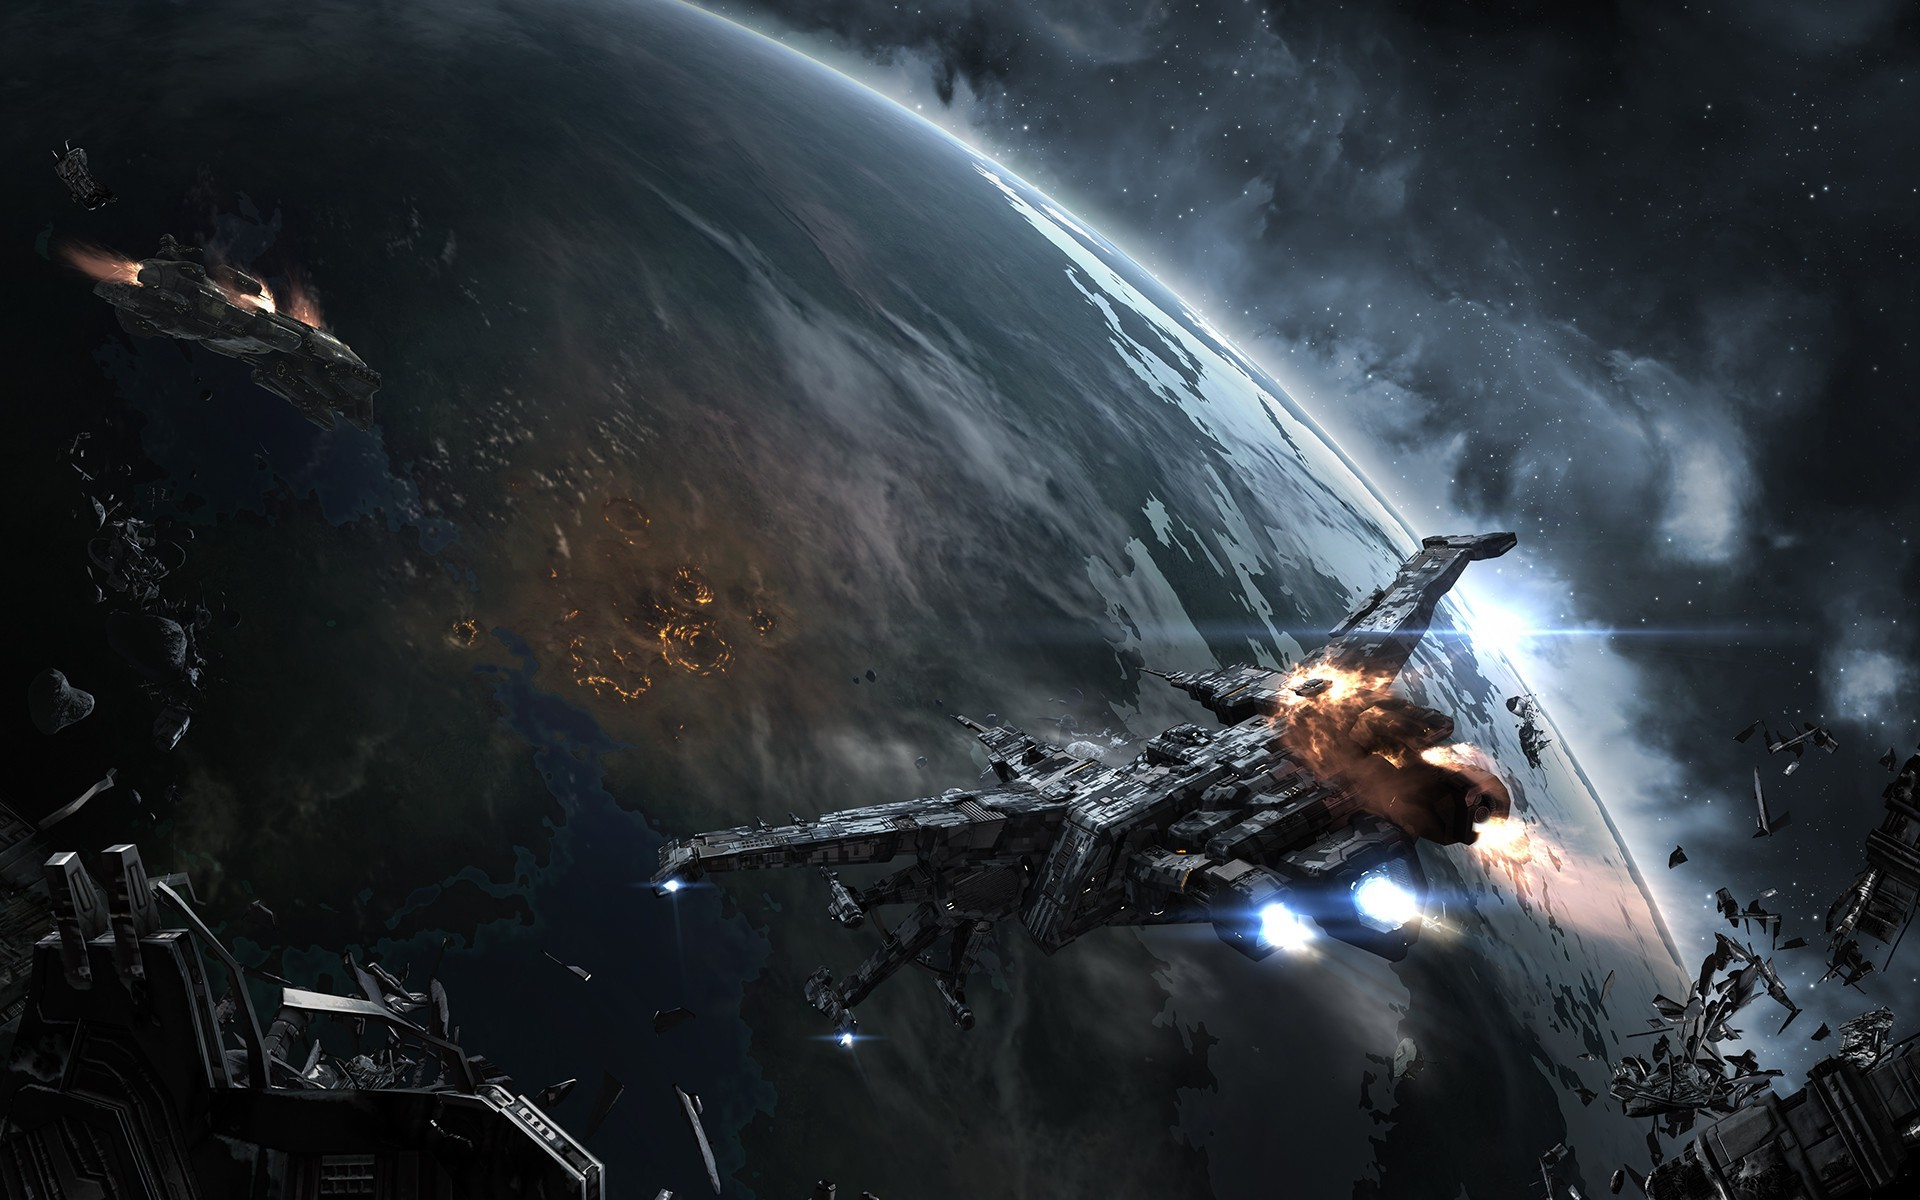 EVE Online, Space, Spaceship, Caldari, Space Battle Wallpapers HD / Desktop  and Mobile Backgrounds